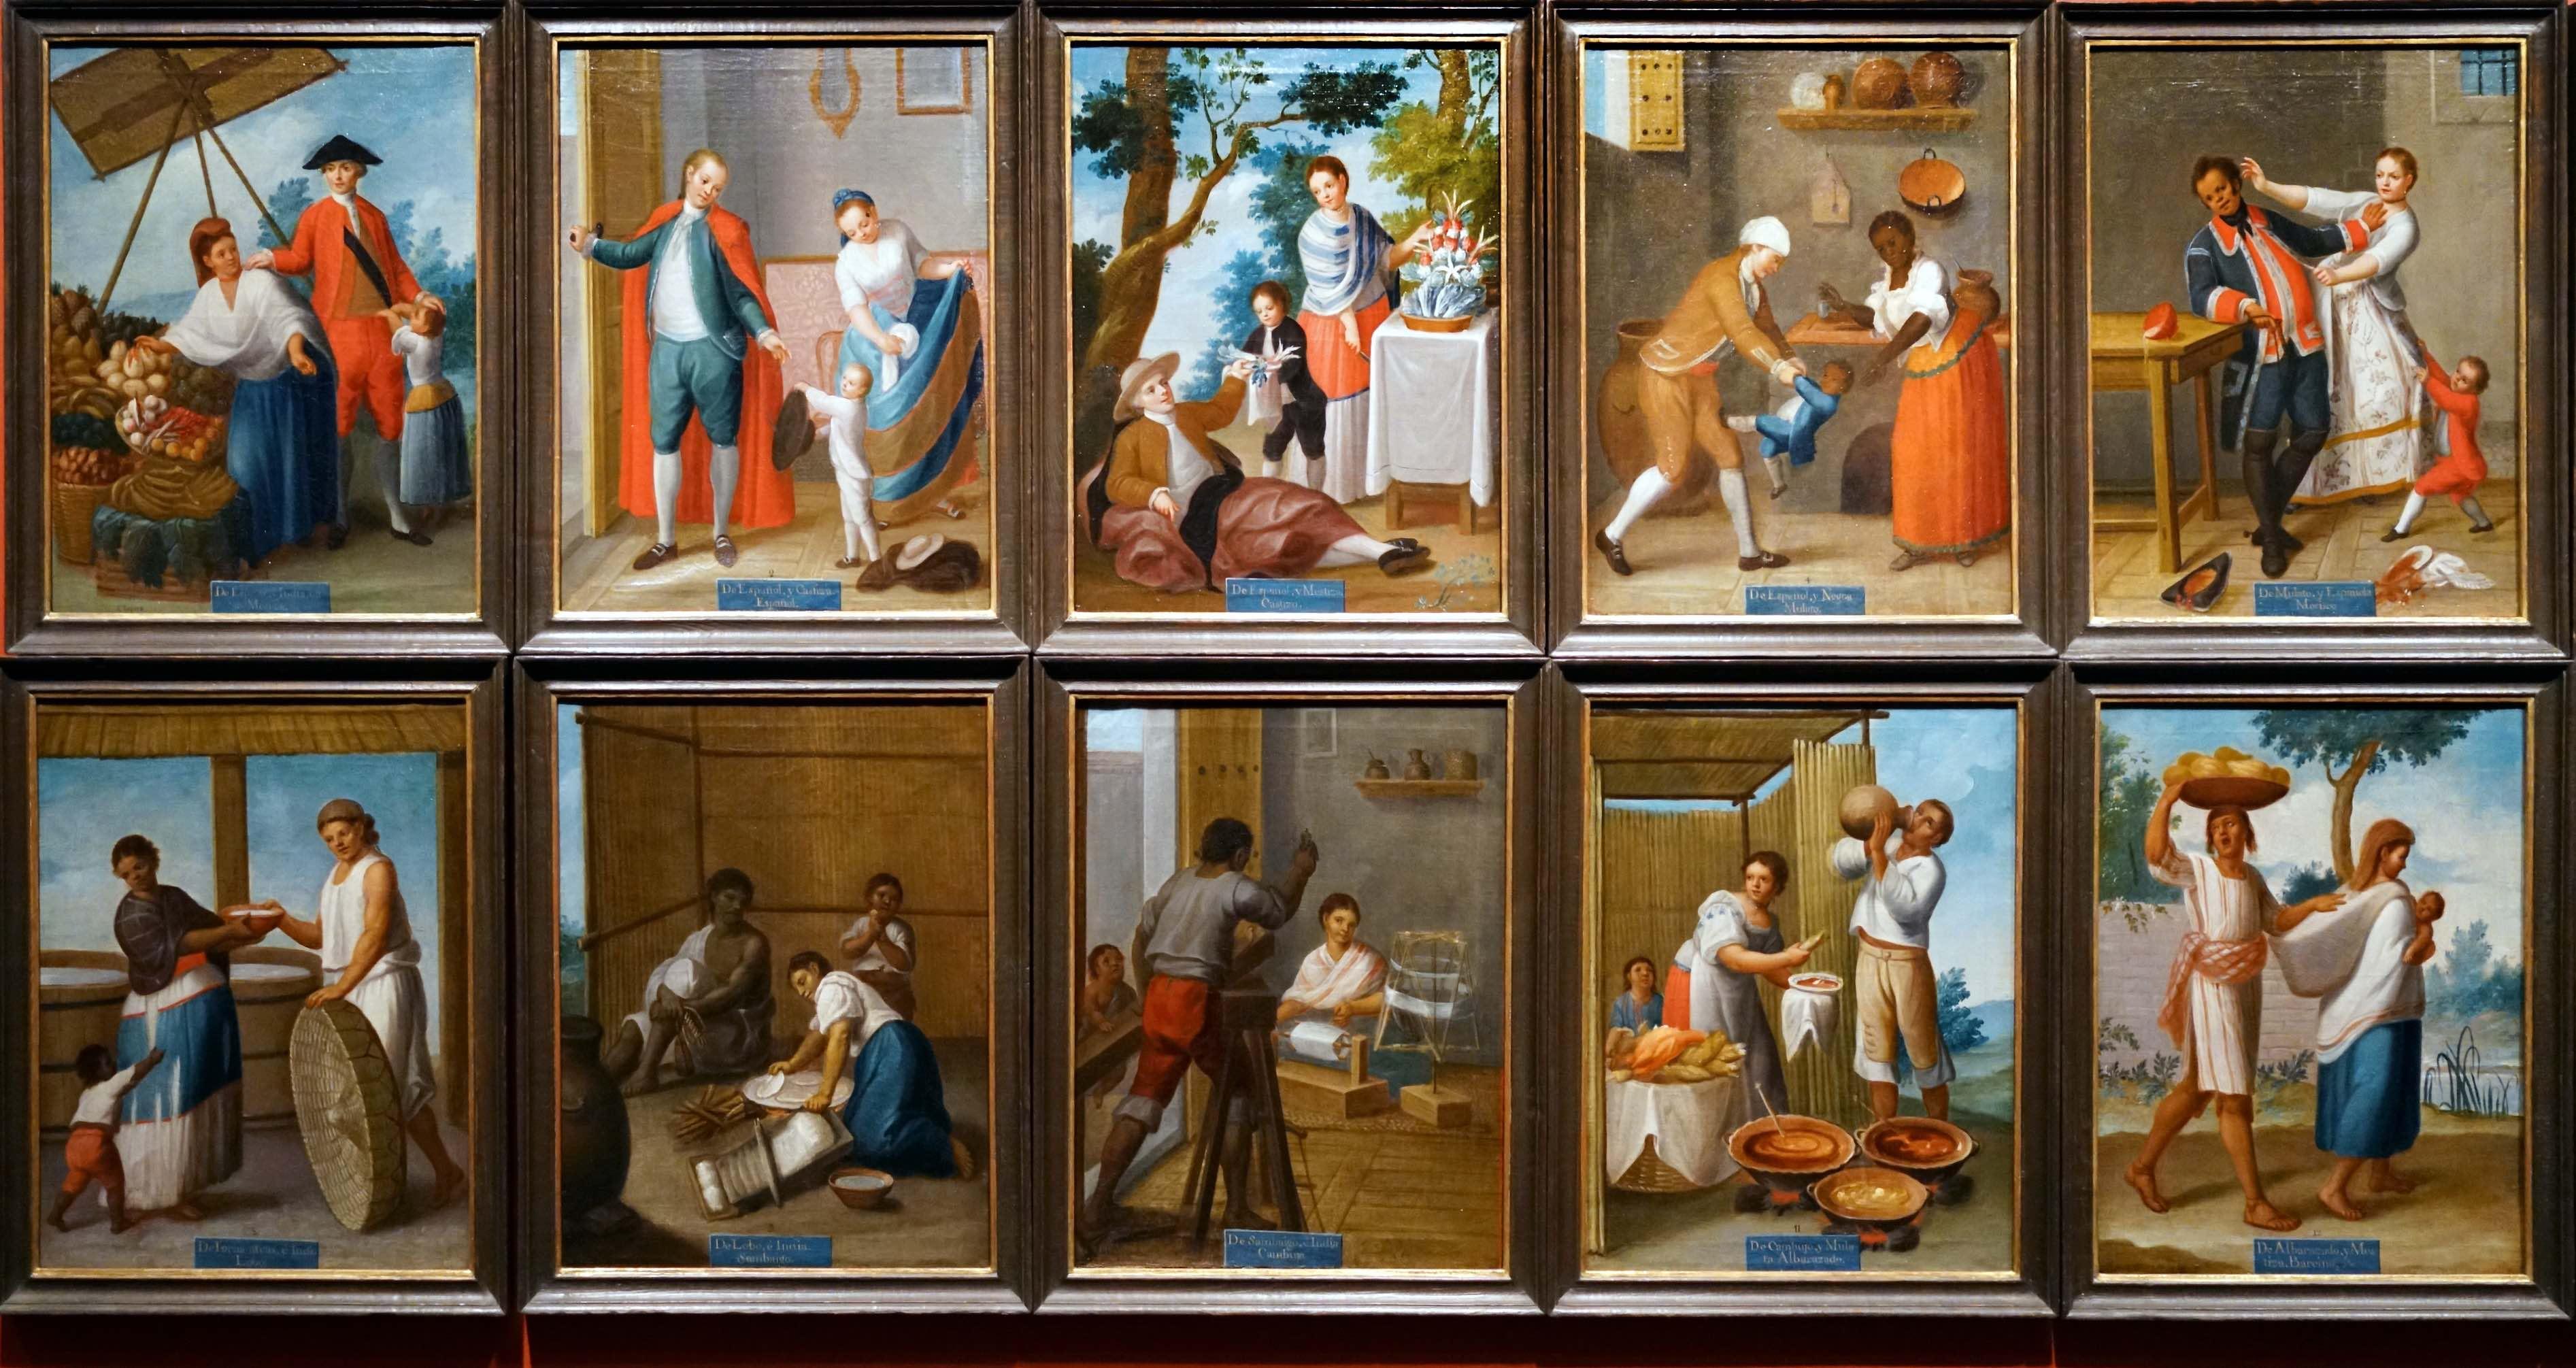 Francisco Clapera, set of sixteen casta paintings, c. 1775, 51.1 x 39.6 cm (Denver Art Museum)